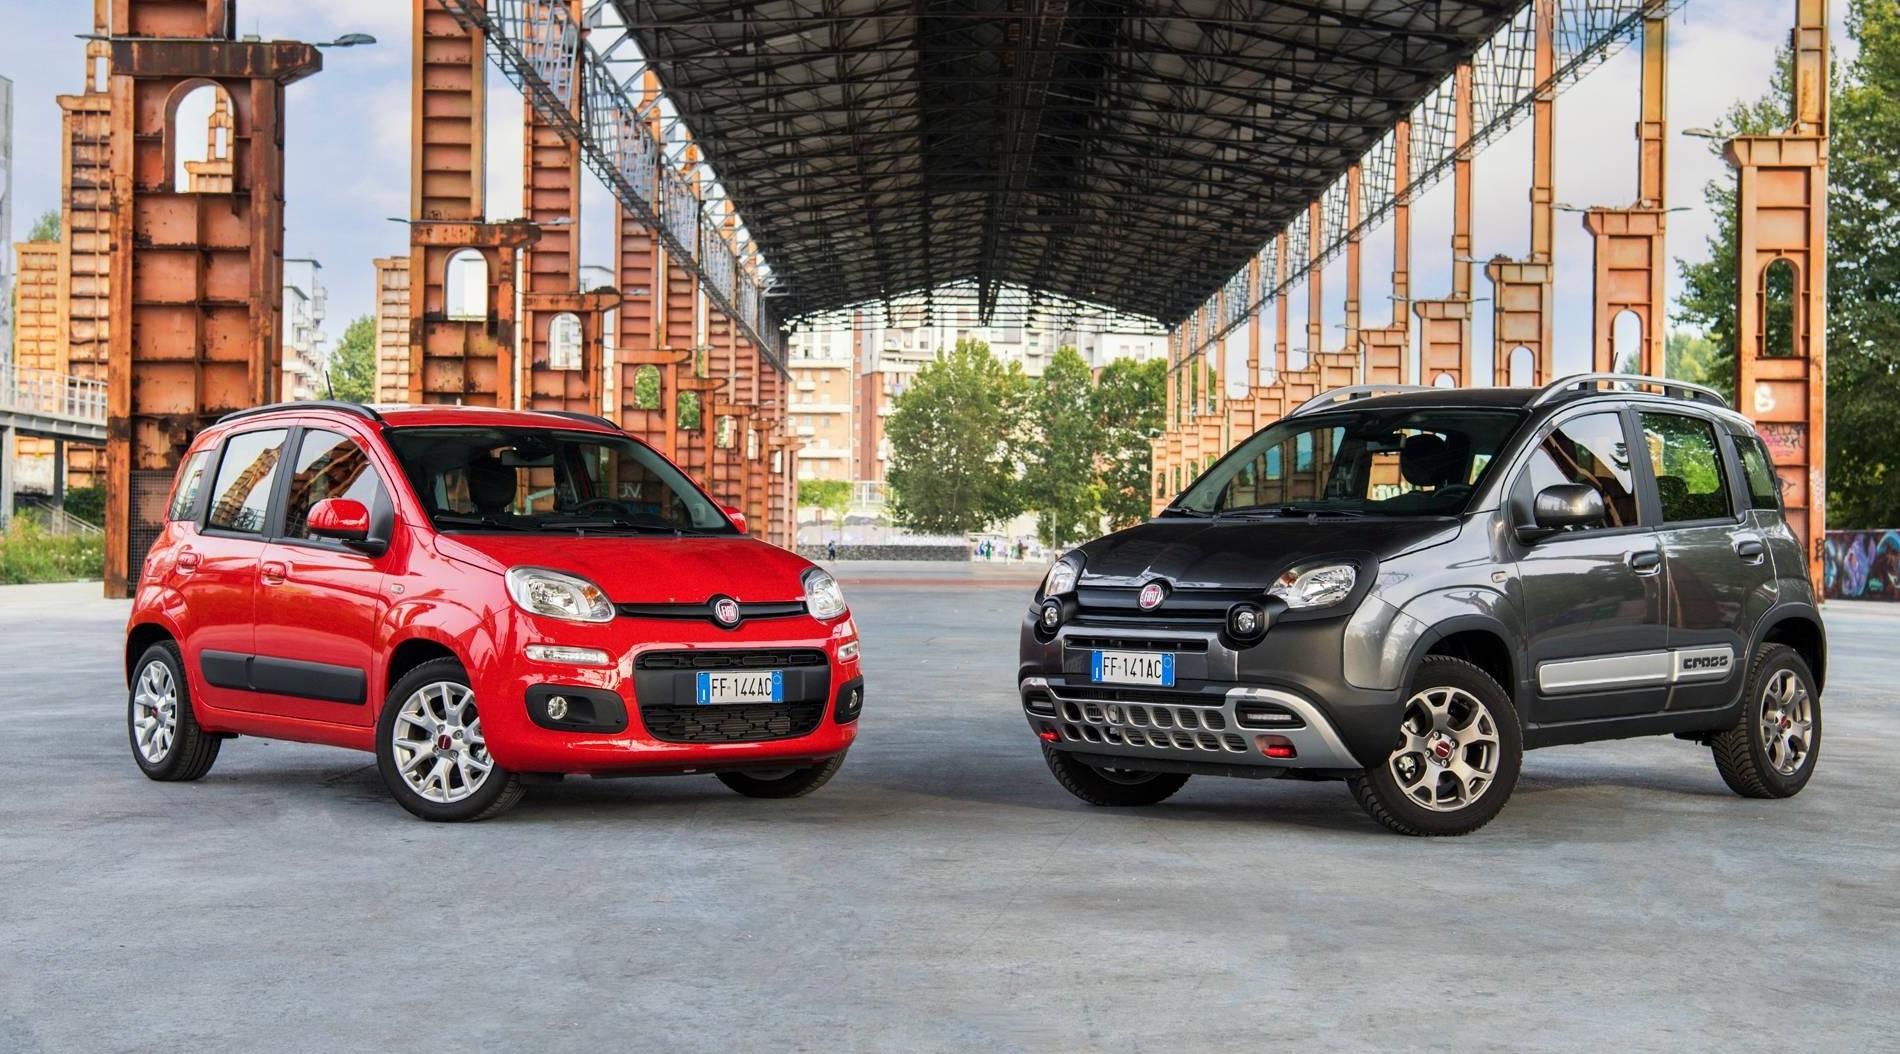 Fiat Panda, Fiat 500 e per numerose altr